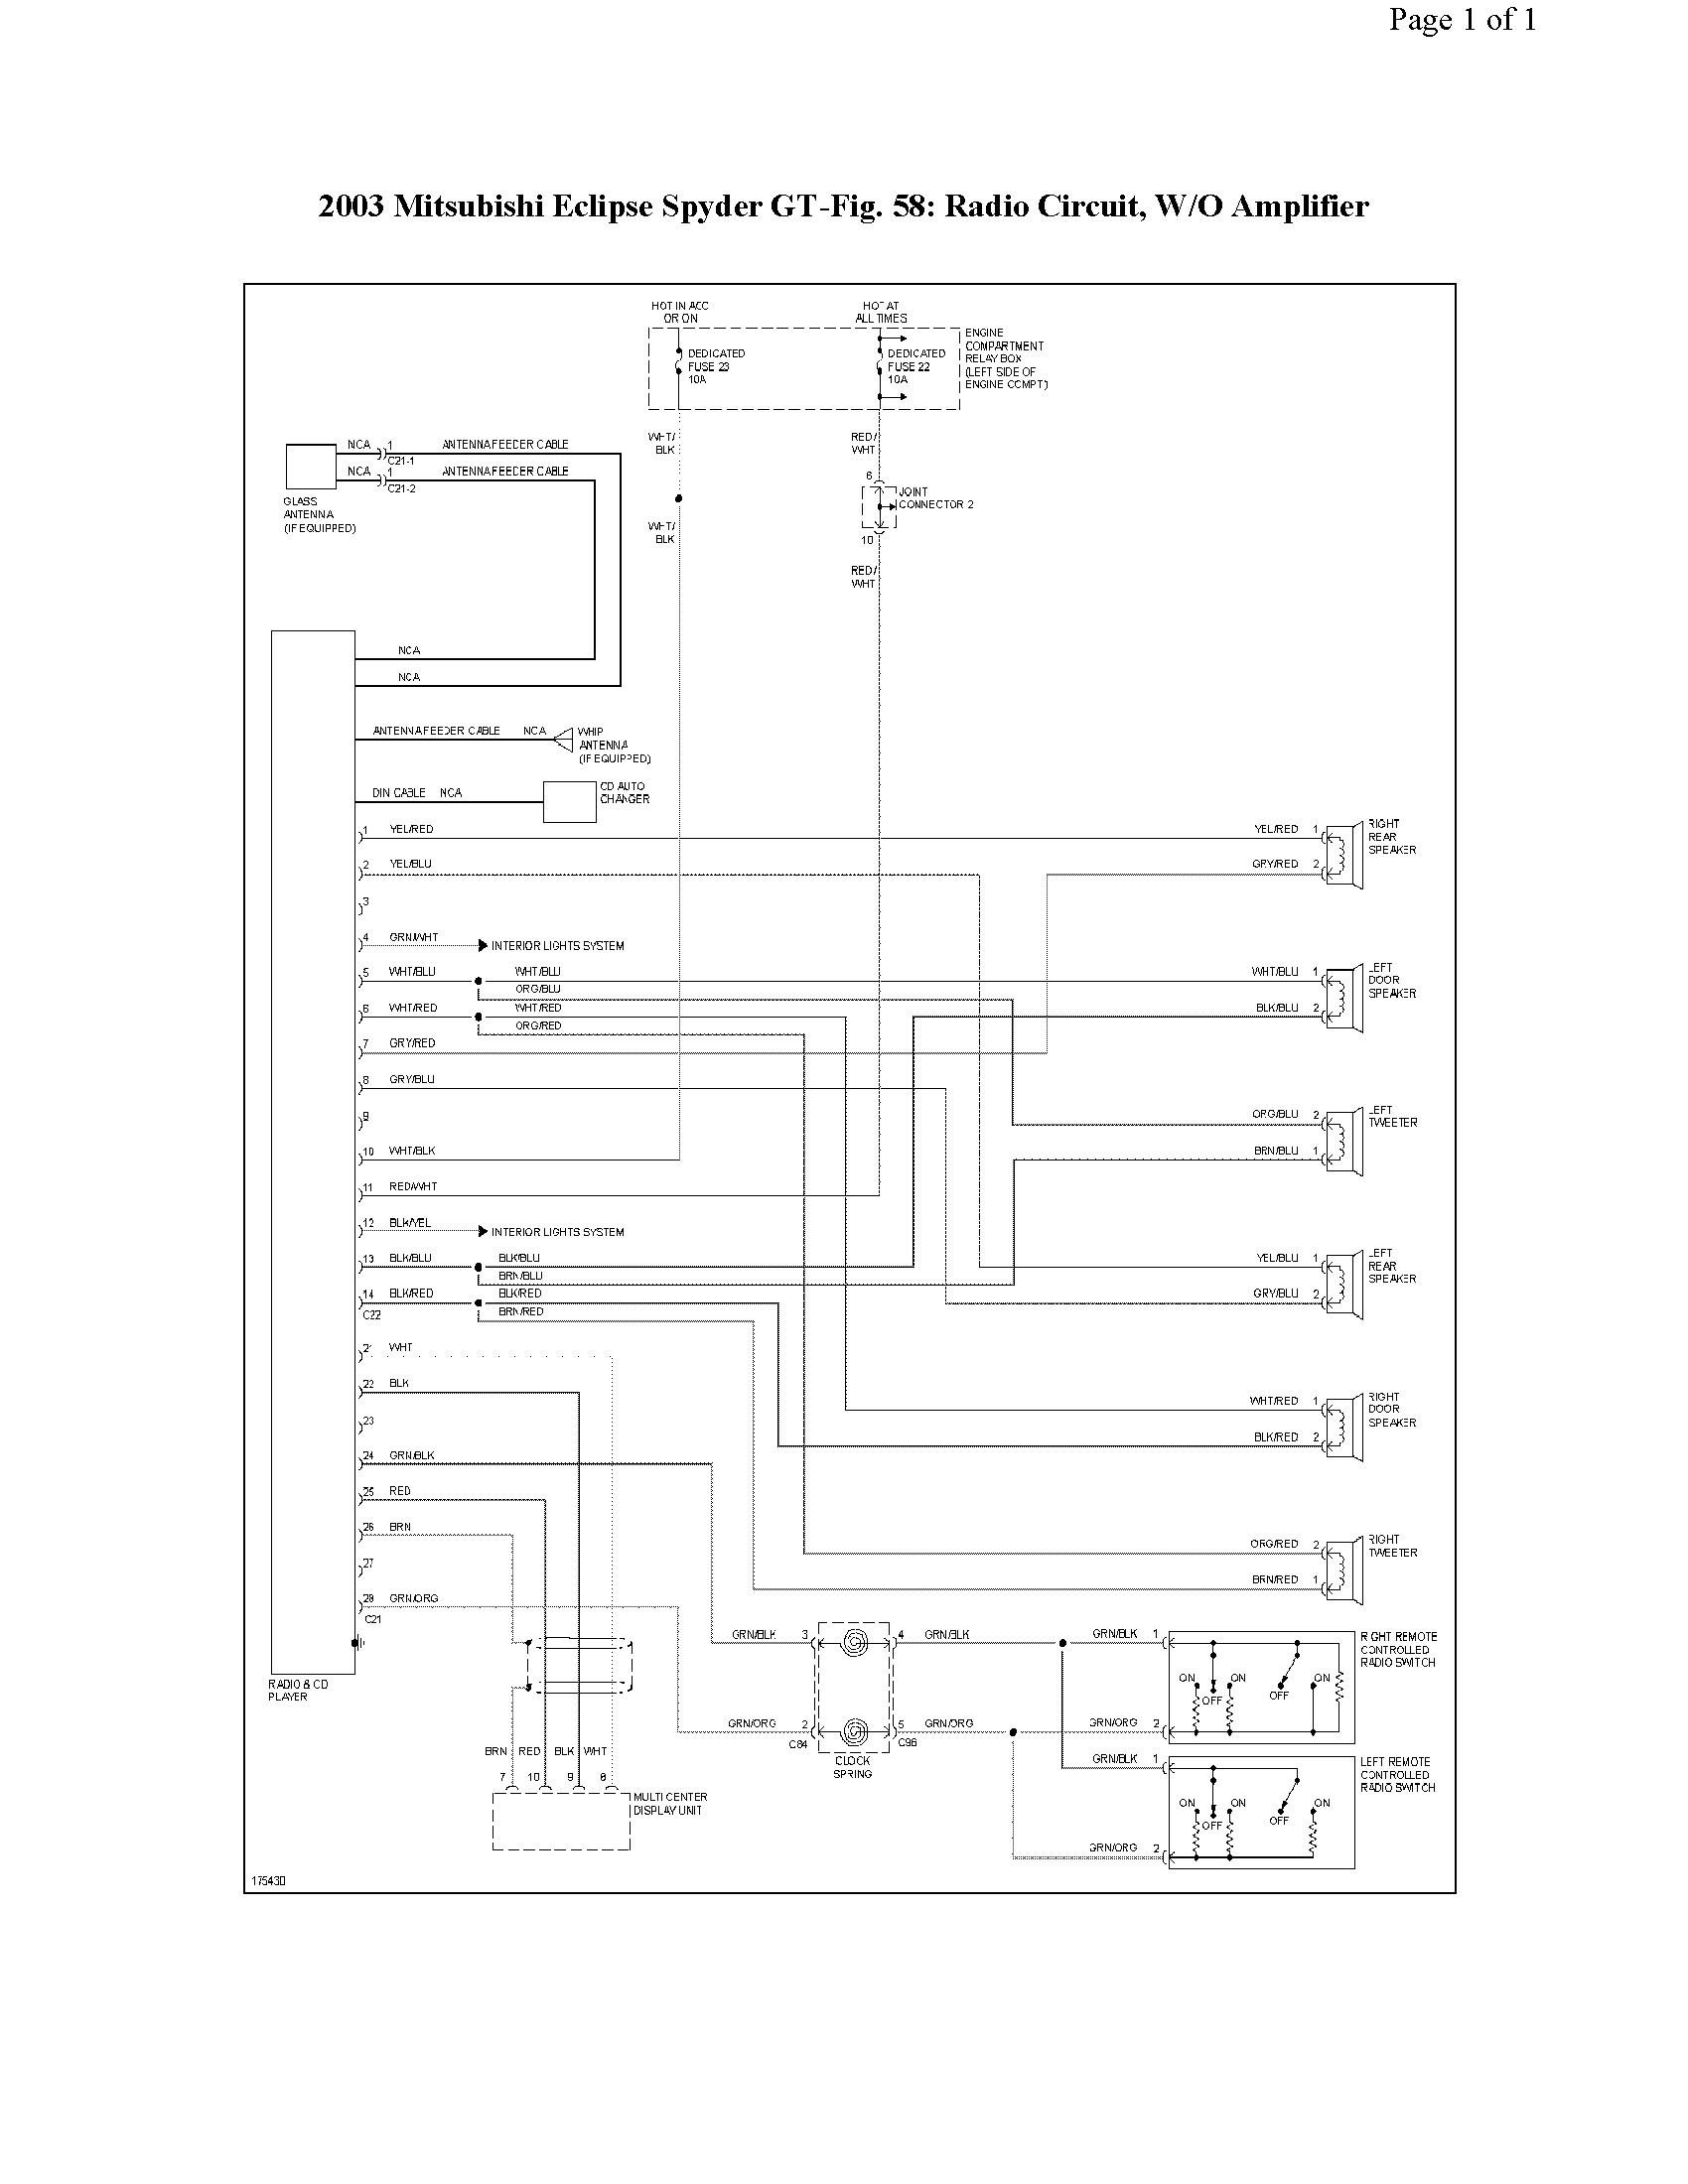 2001 mitsubishi eclipse radio wiring diagram 2000 volvo v70 engine library